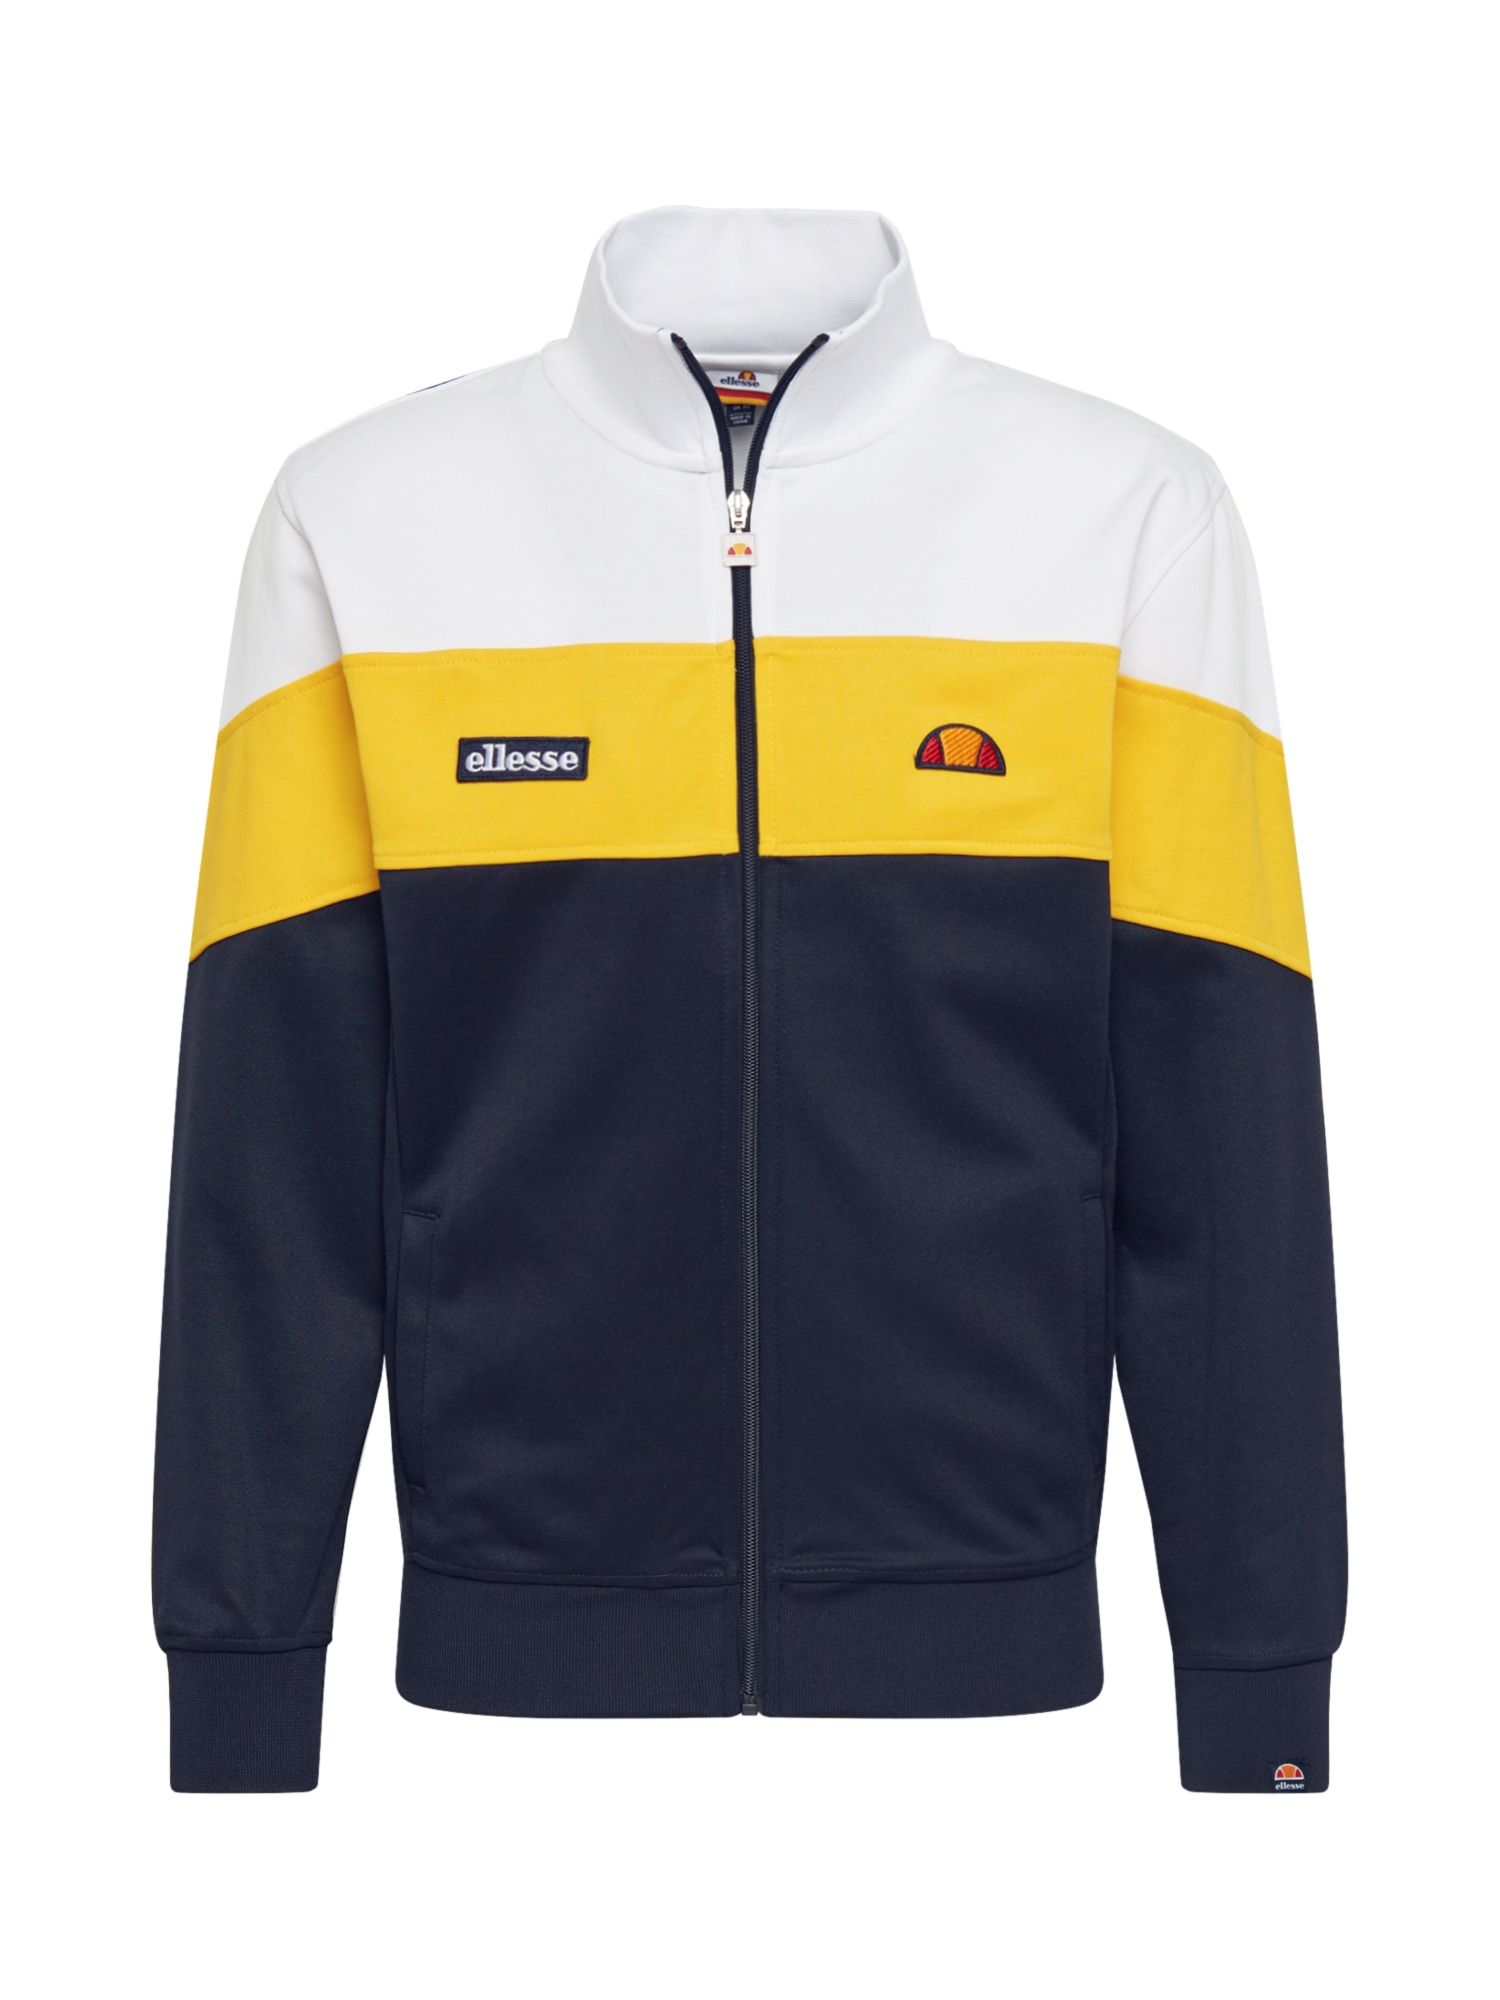 ELLESSE Prechodná bunda 'Caprini'  biela / žlté / čierna / tmavomodrá